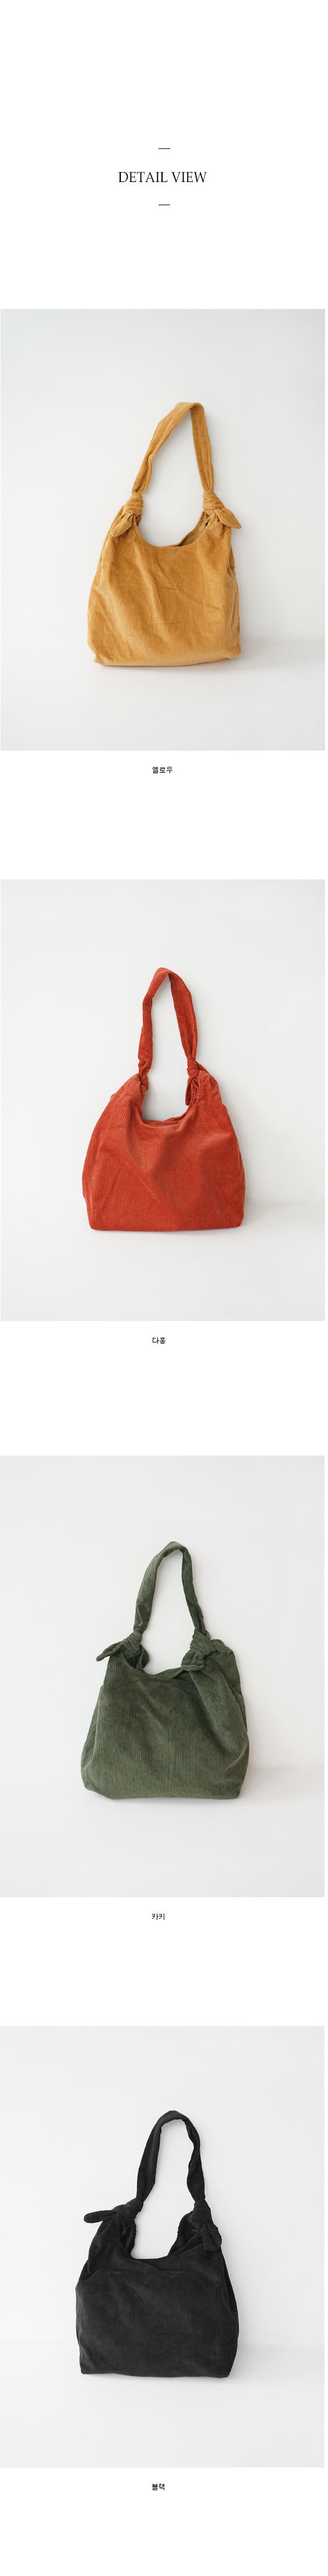 corduroy tote bag (4colors)